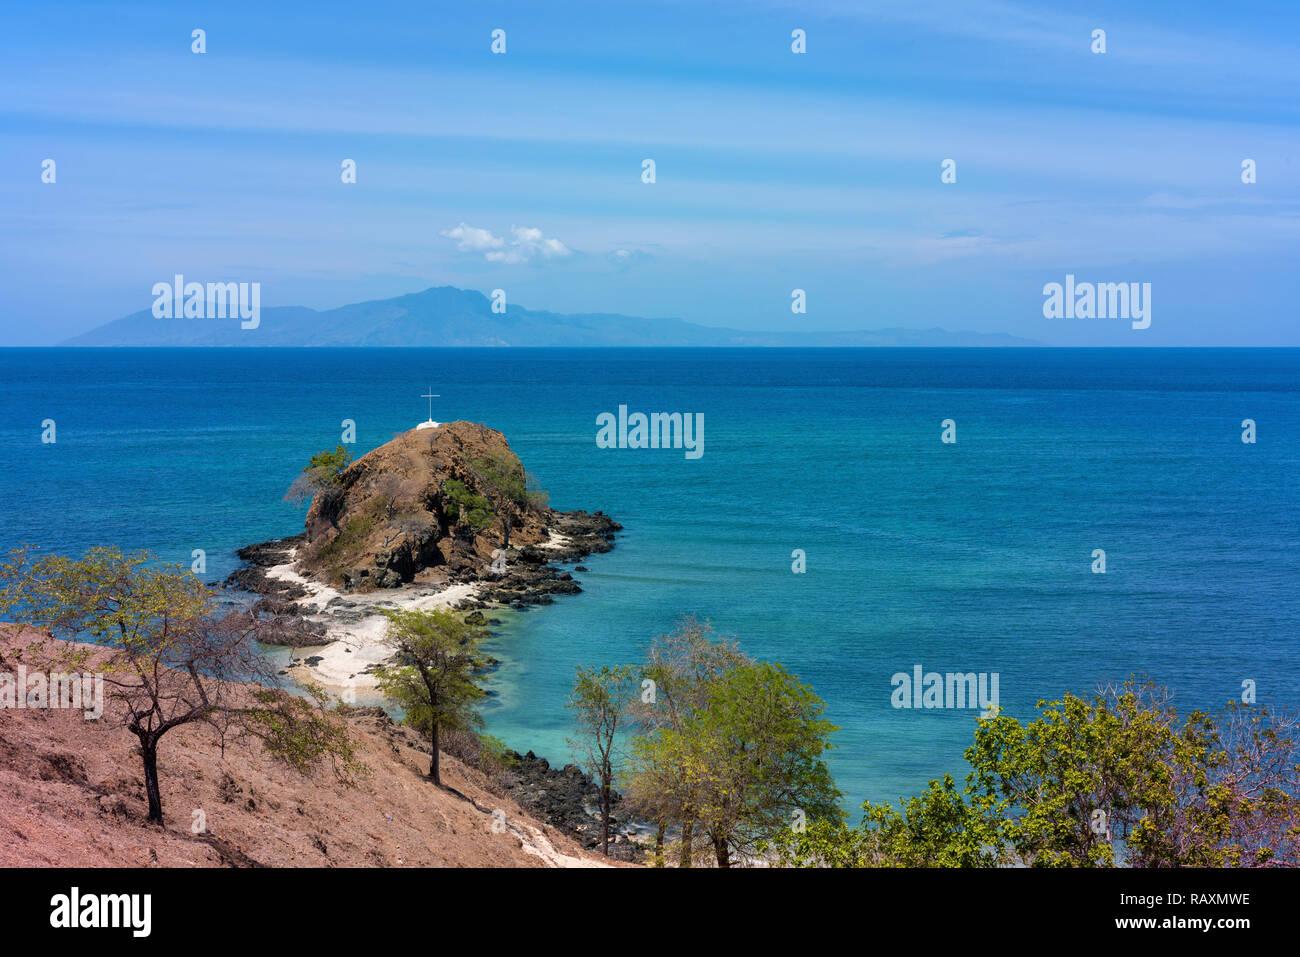 Looking across the Banda Sea toward Atauro Island from the north coast of Timor Leste. - Stock Image